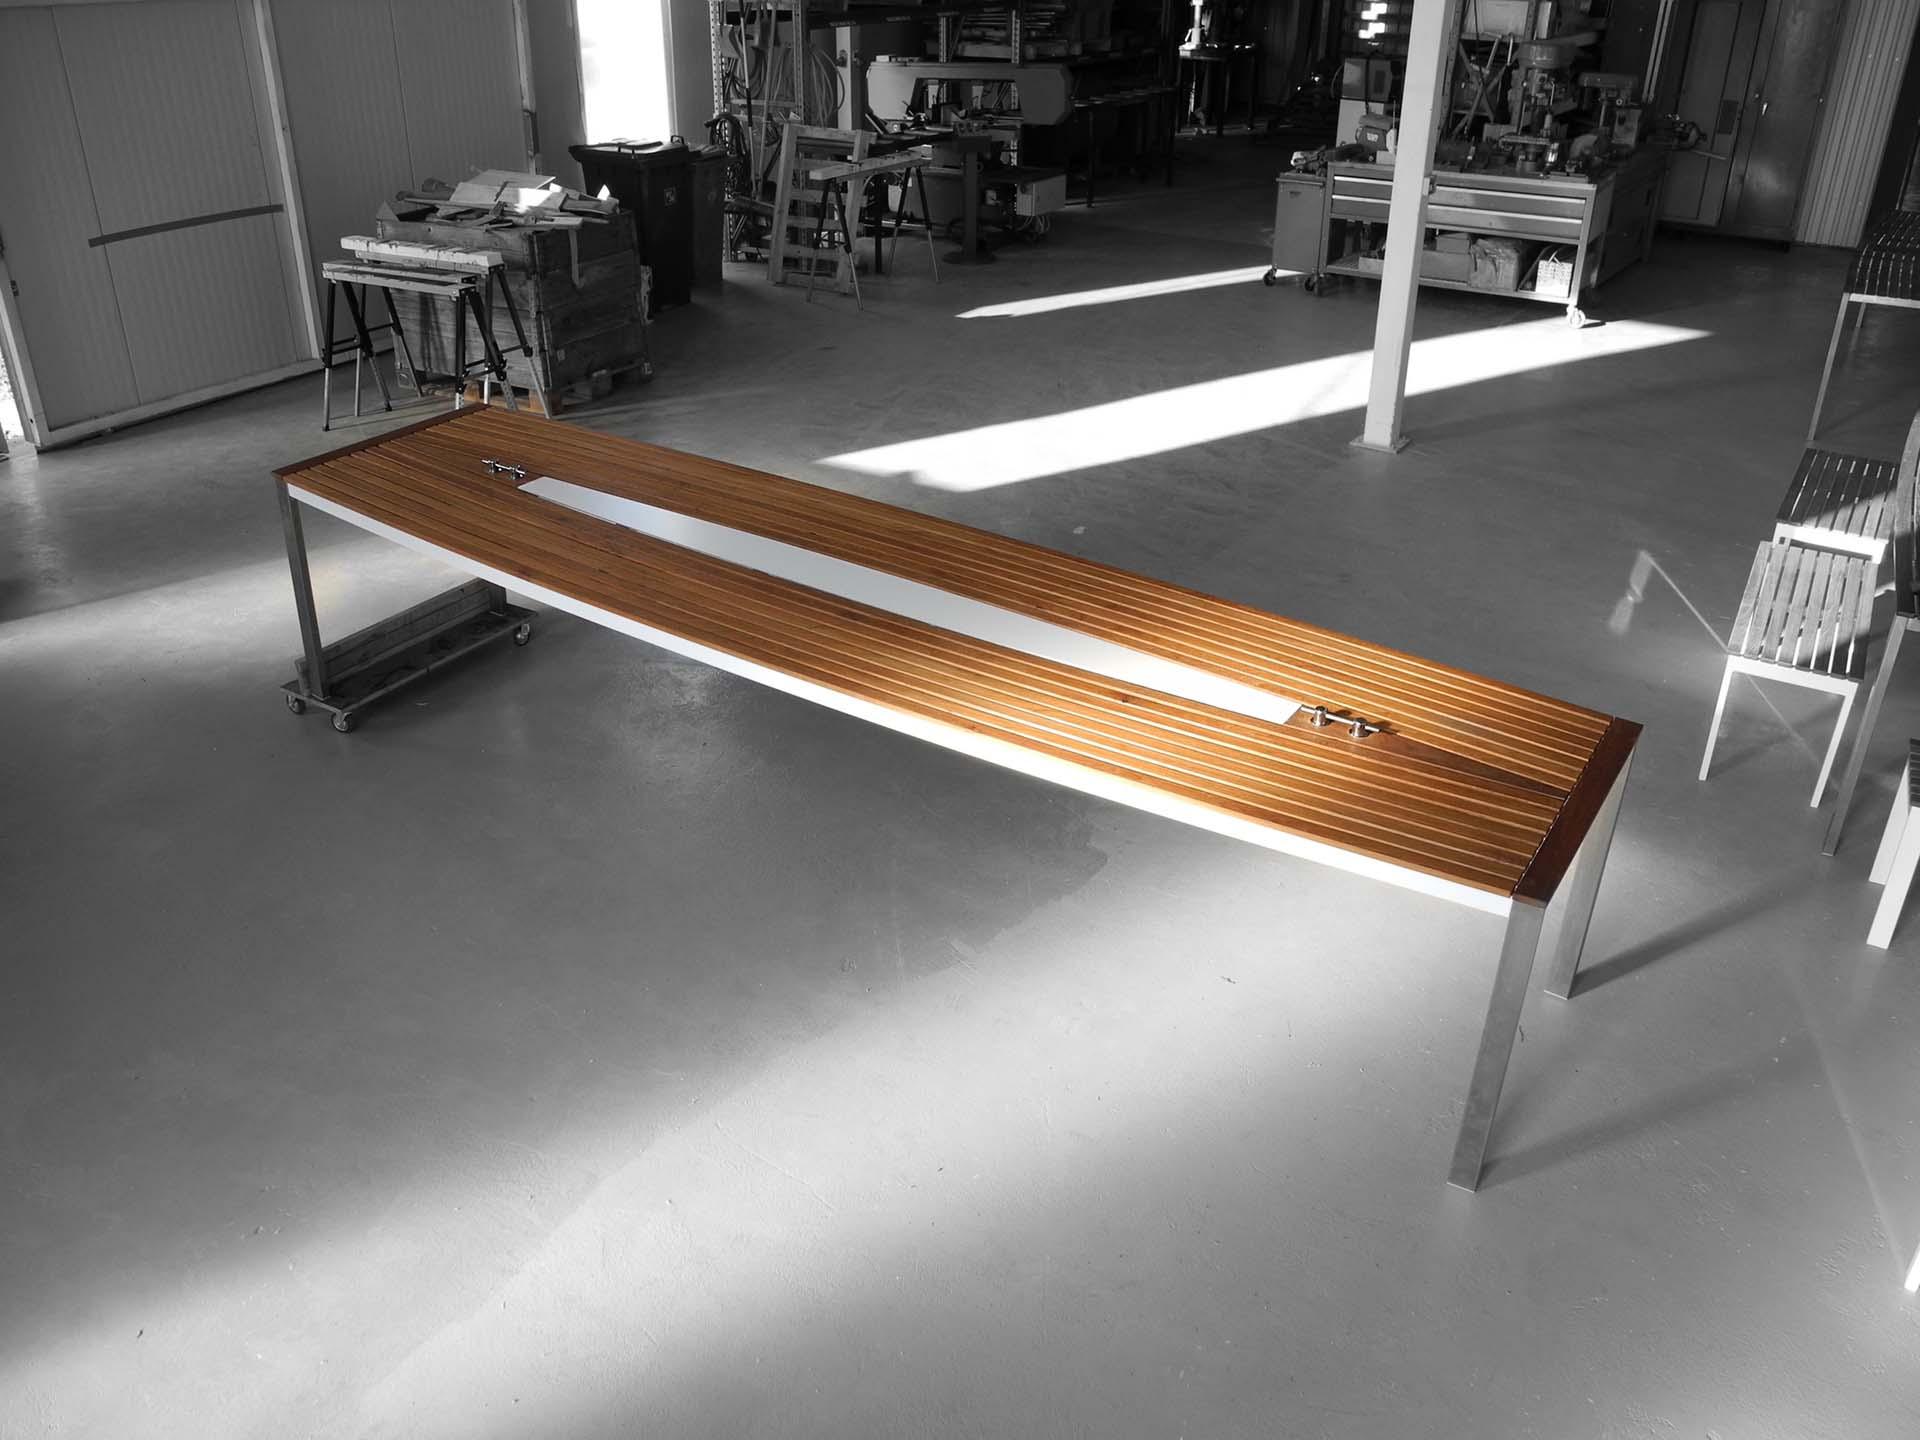 Design Tisch Sealine Nummer 6 aus Edelstahl Teak by Sebastian Bohry